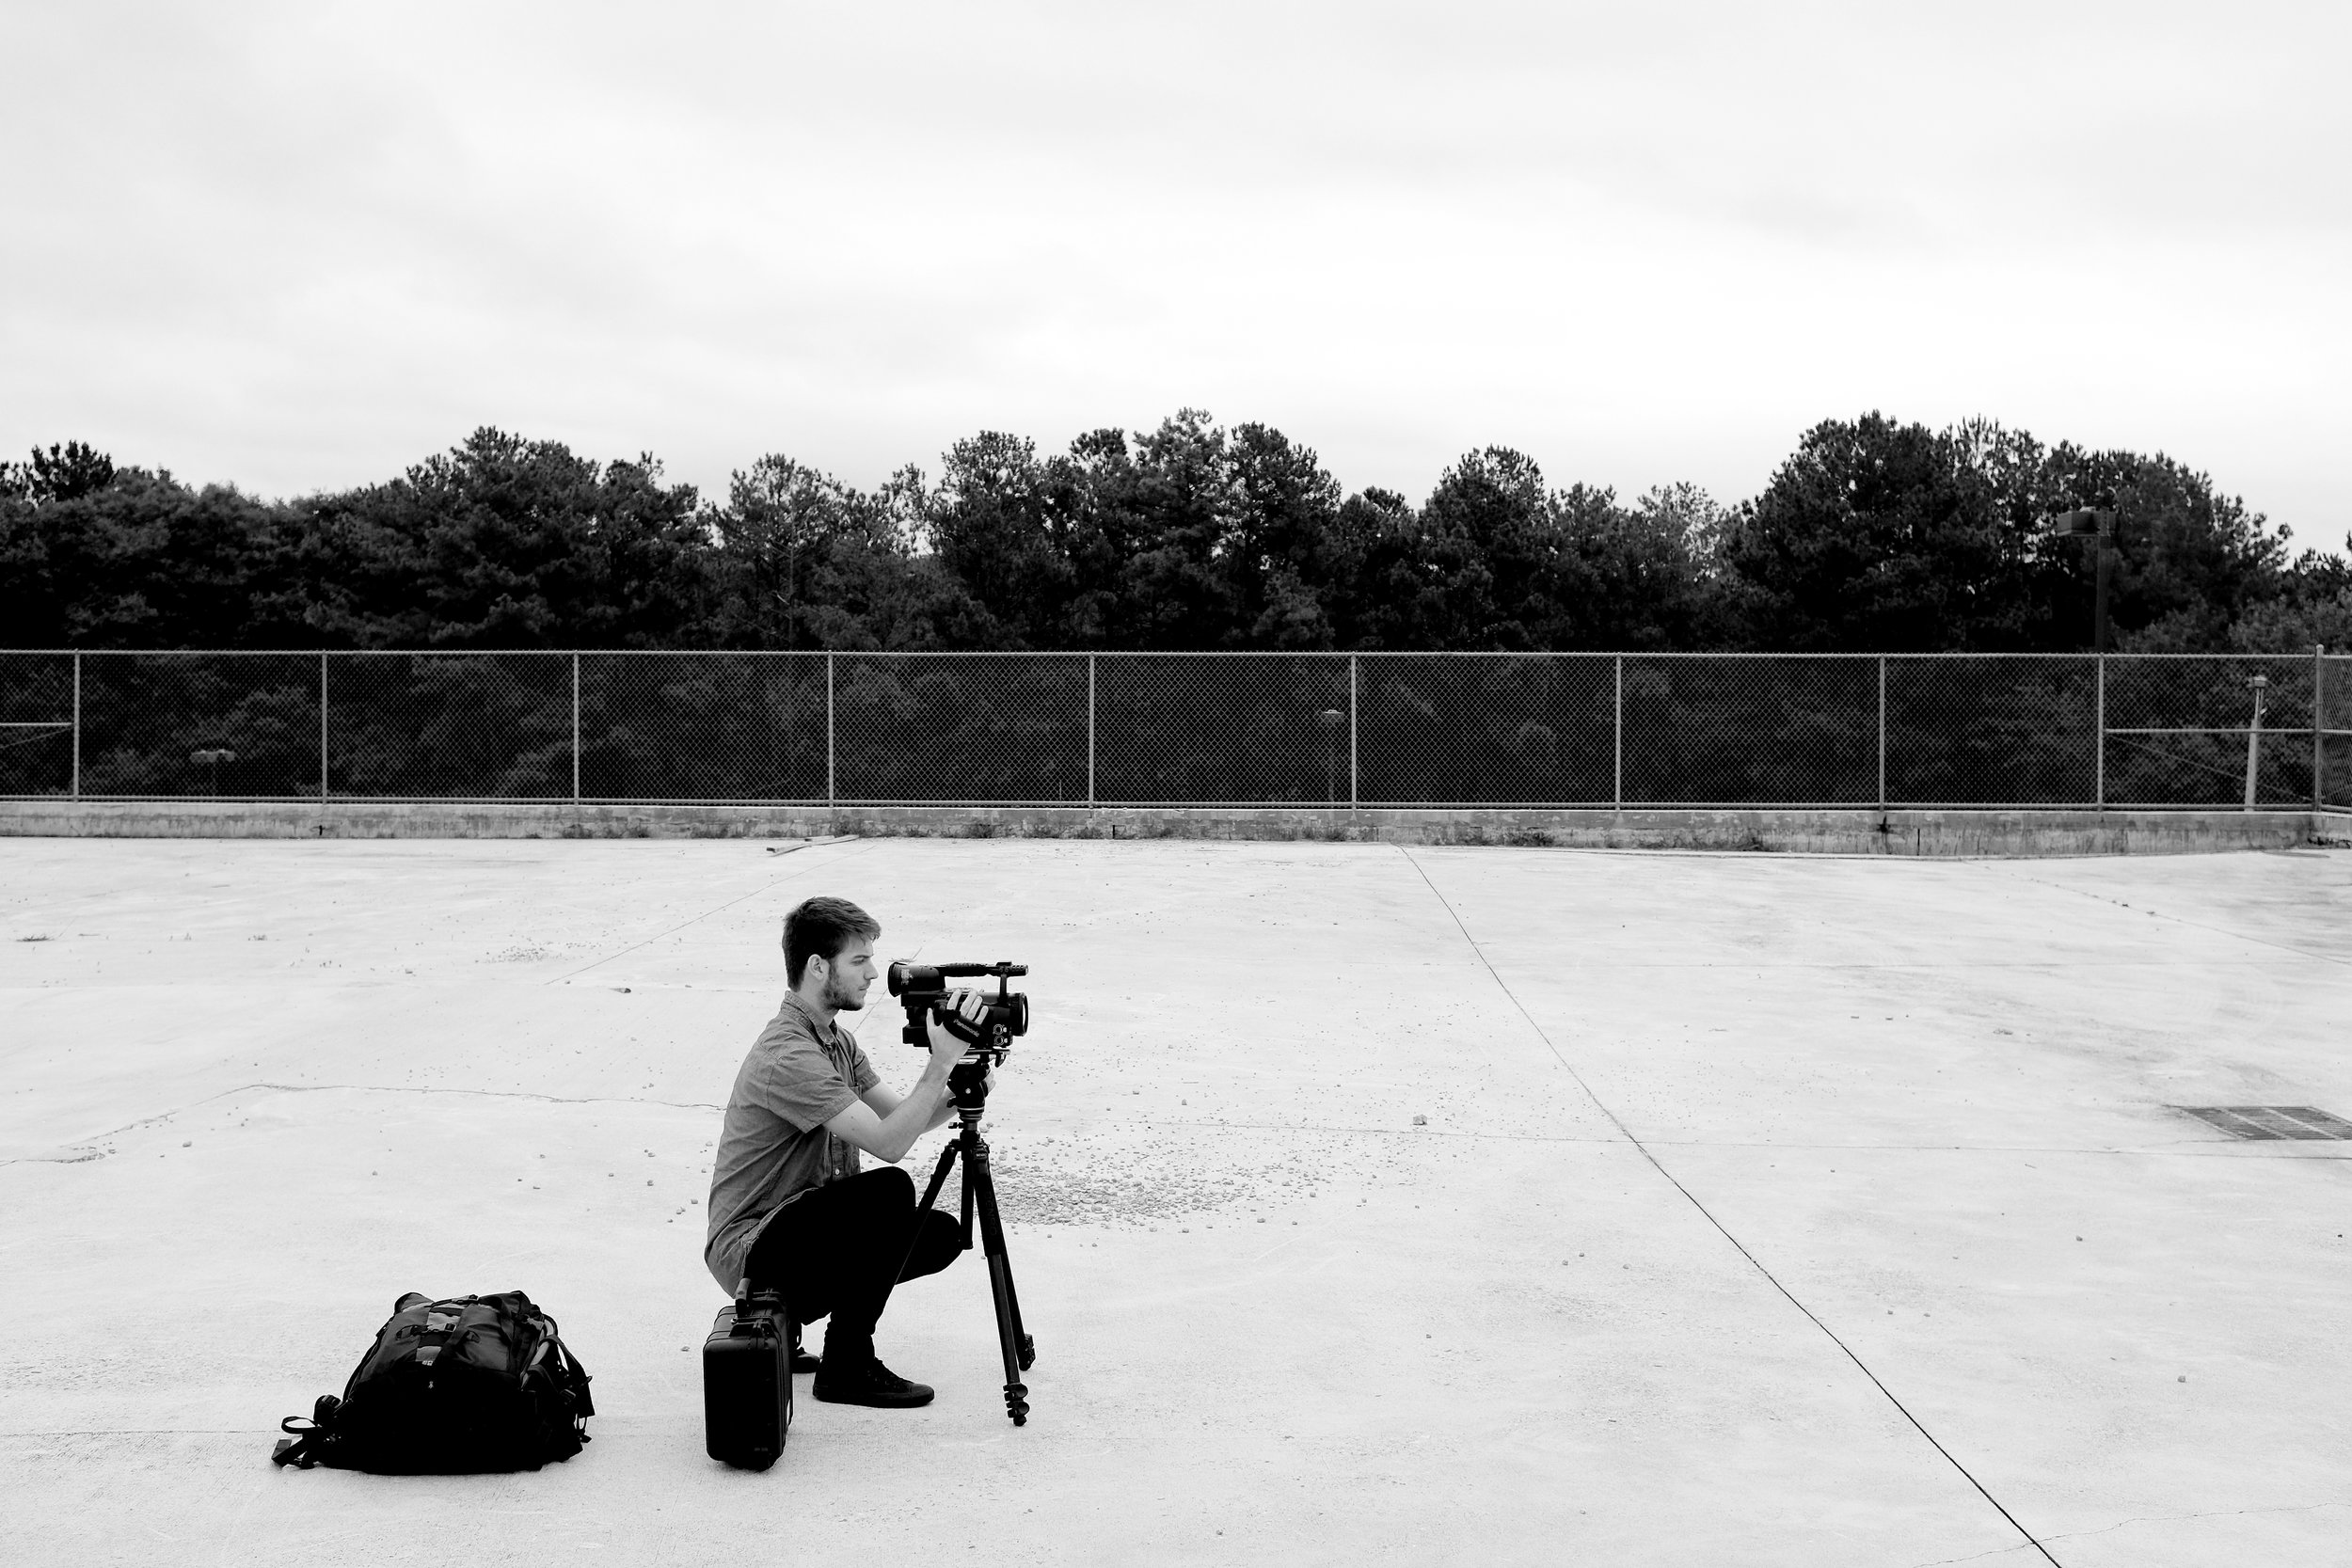 20_Sizemore Dead Filming Atlanta.jpg